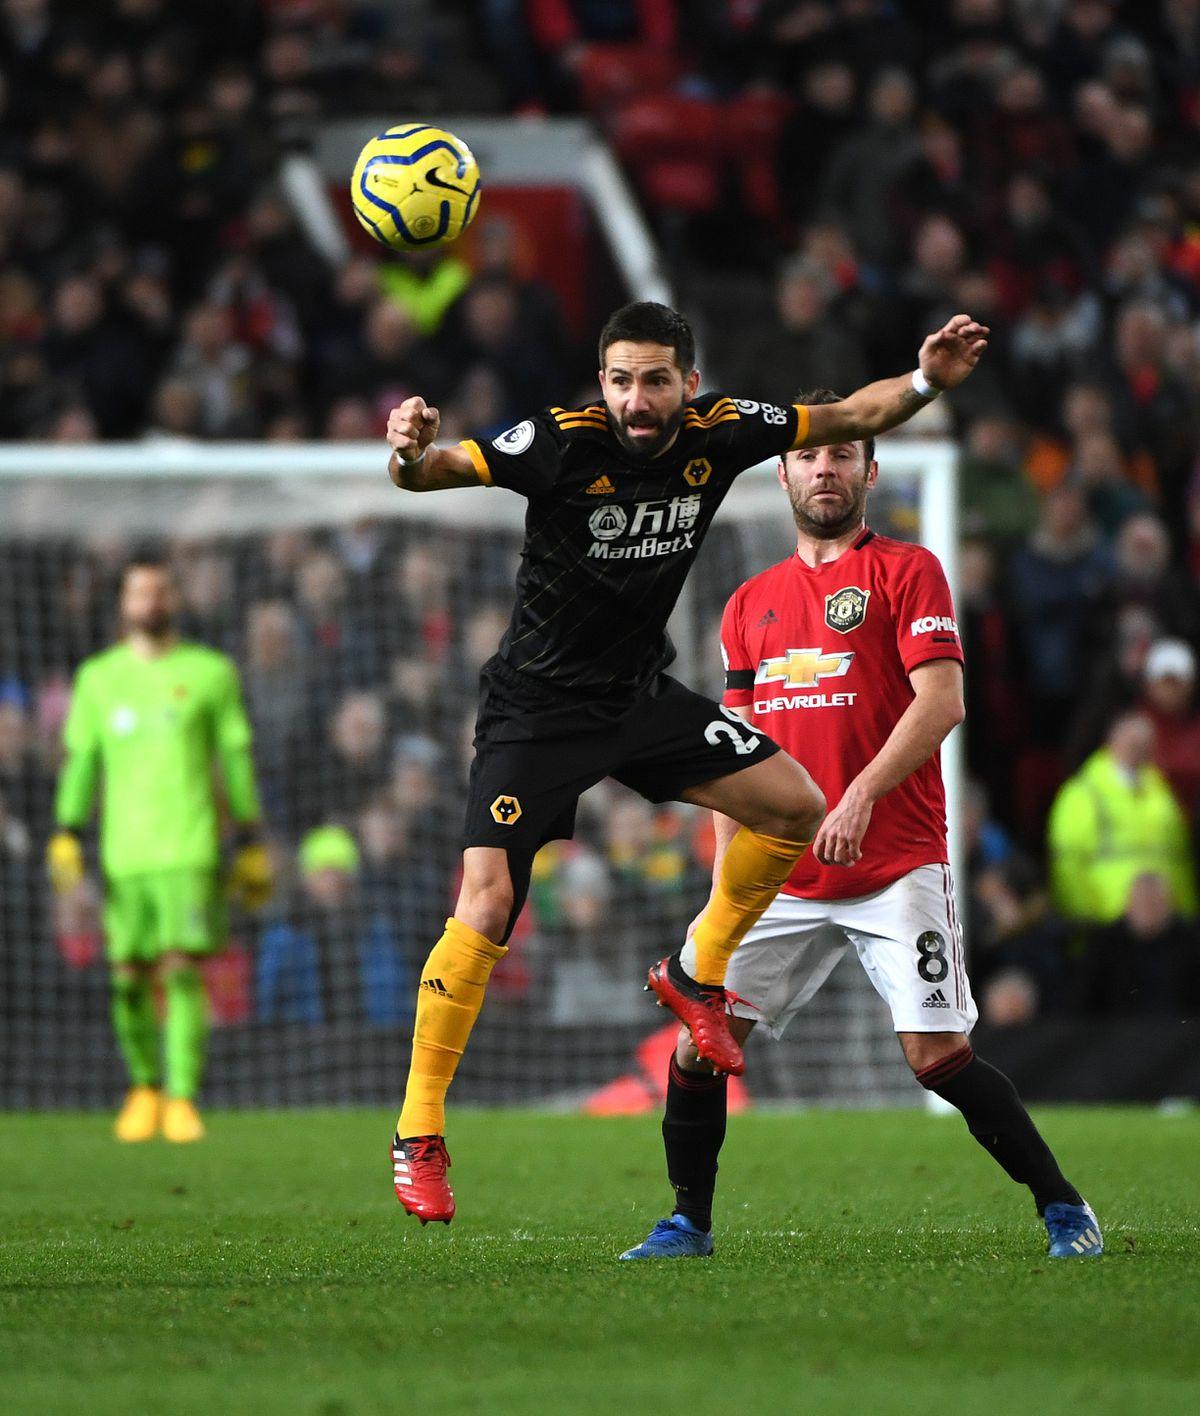 Man Utd v Wolves action (AMA)